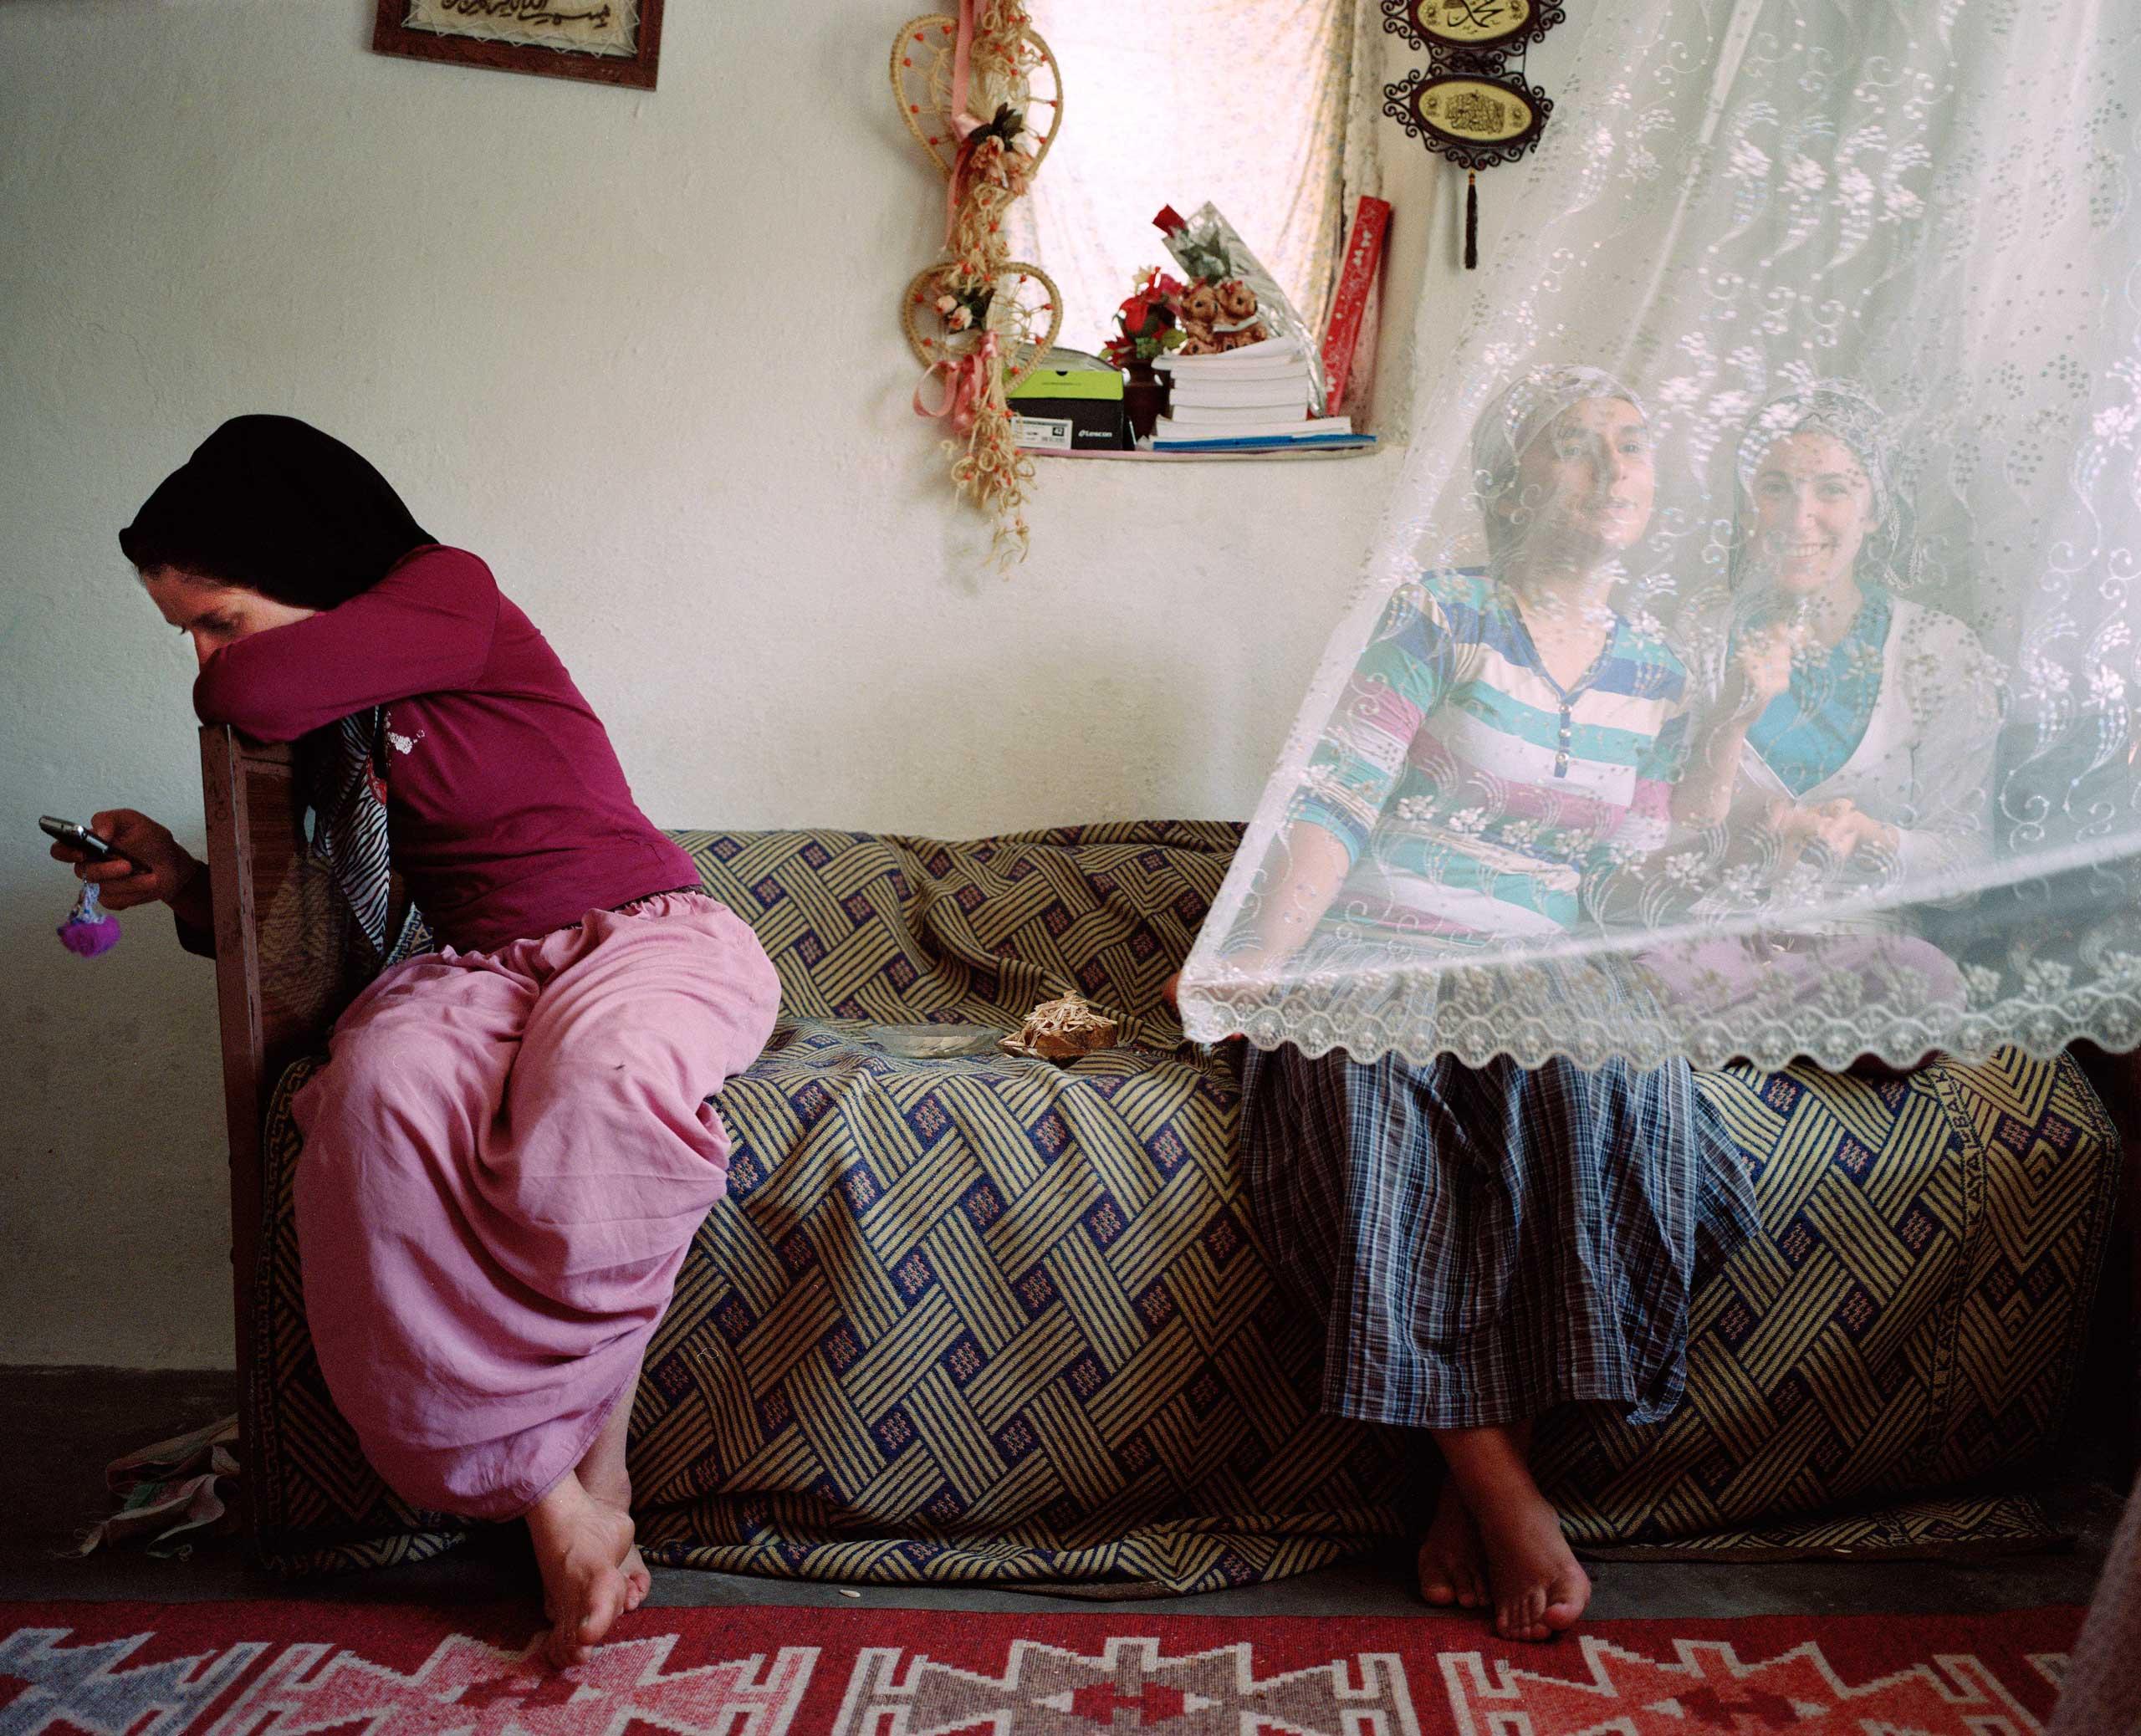 Local girls meet over a çay, or tea, together. Hasankeyf, Turkey.